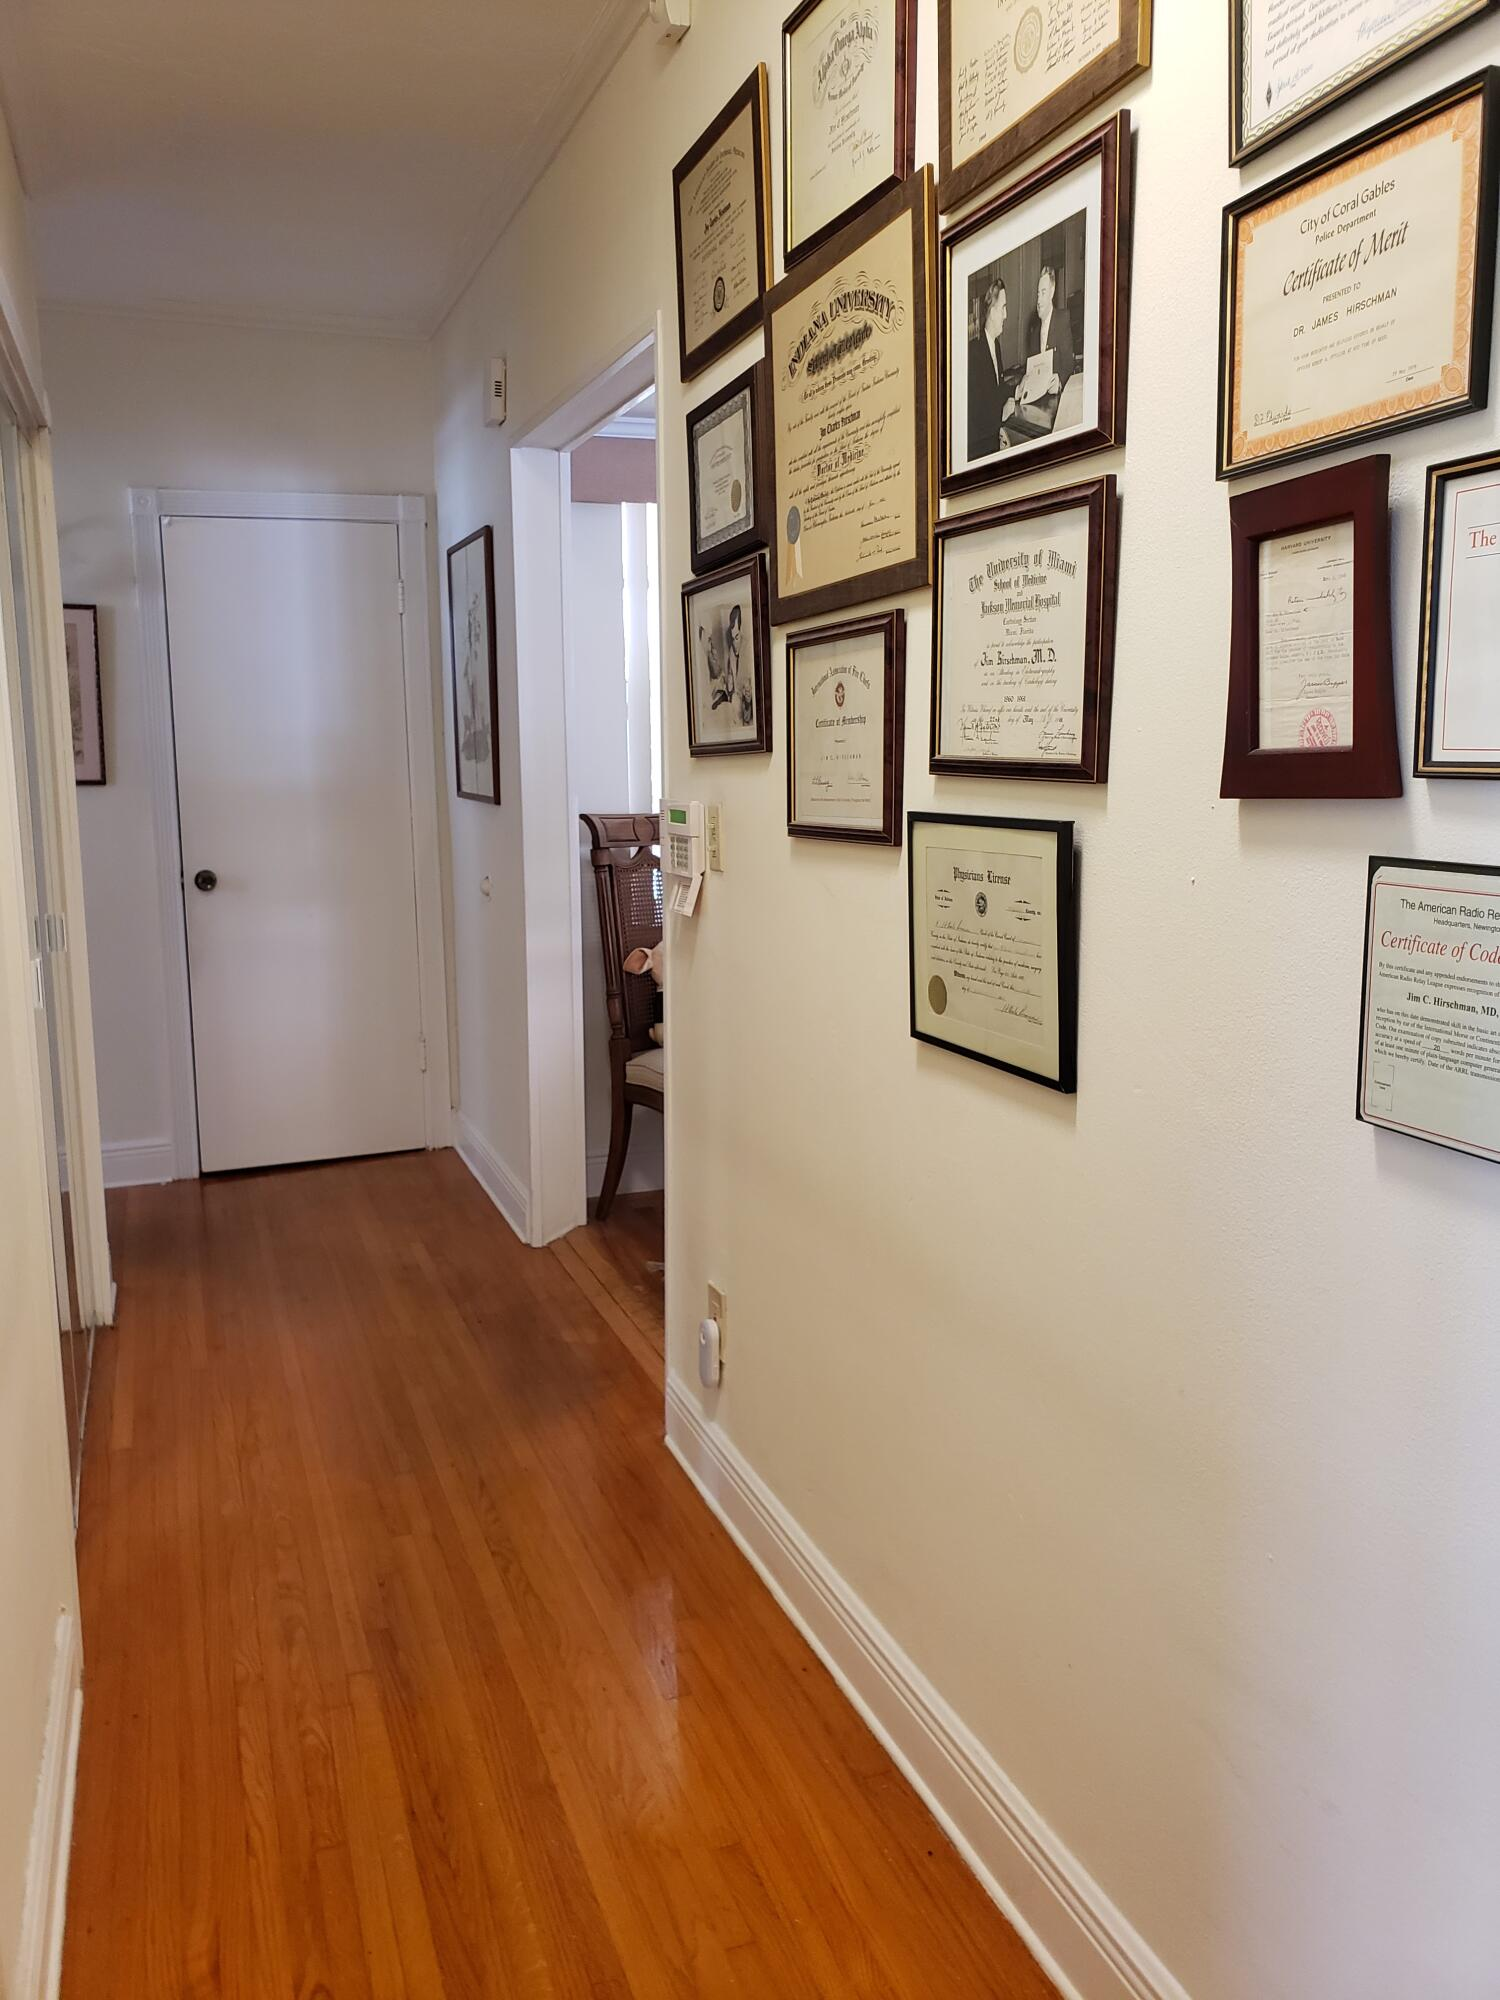 Hallway to other bedrooms